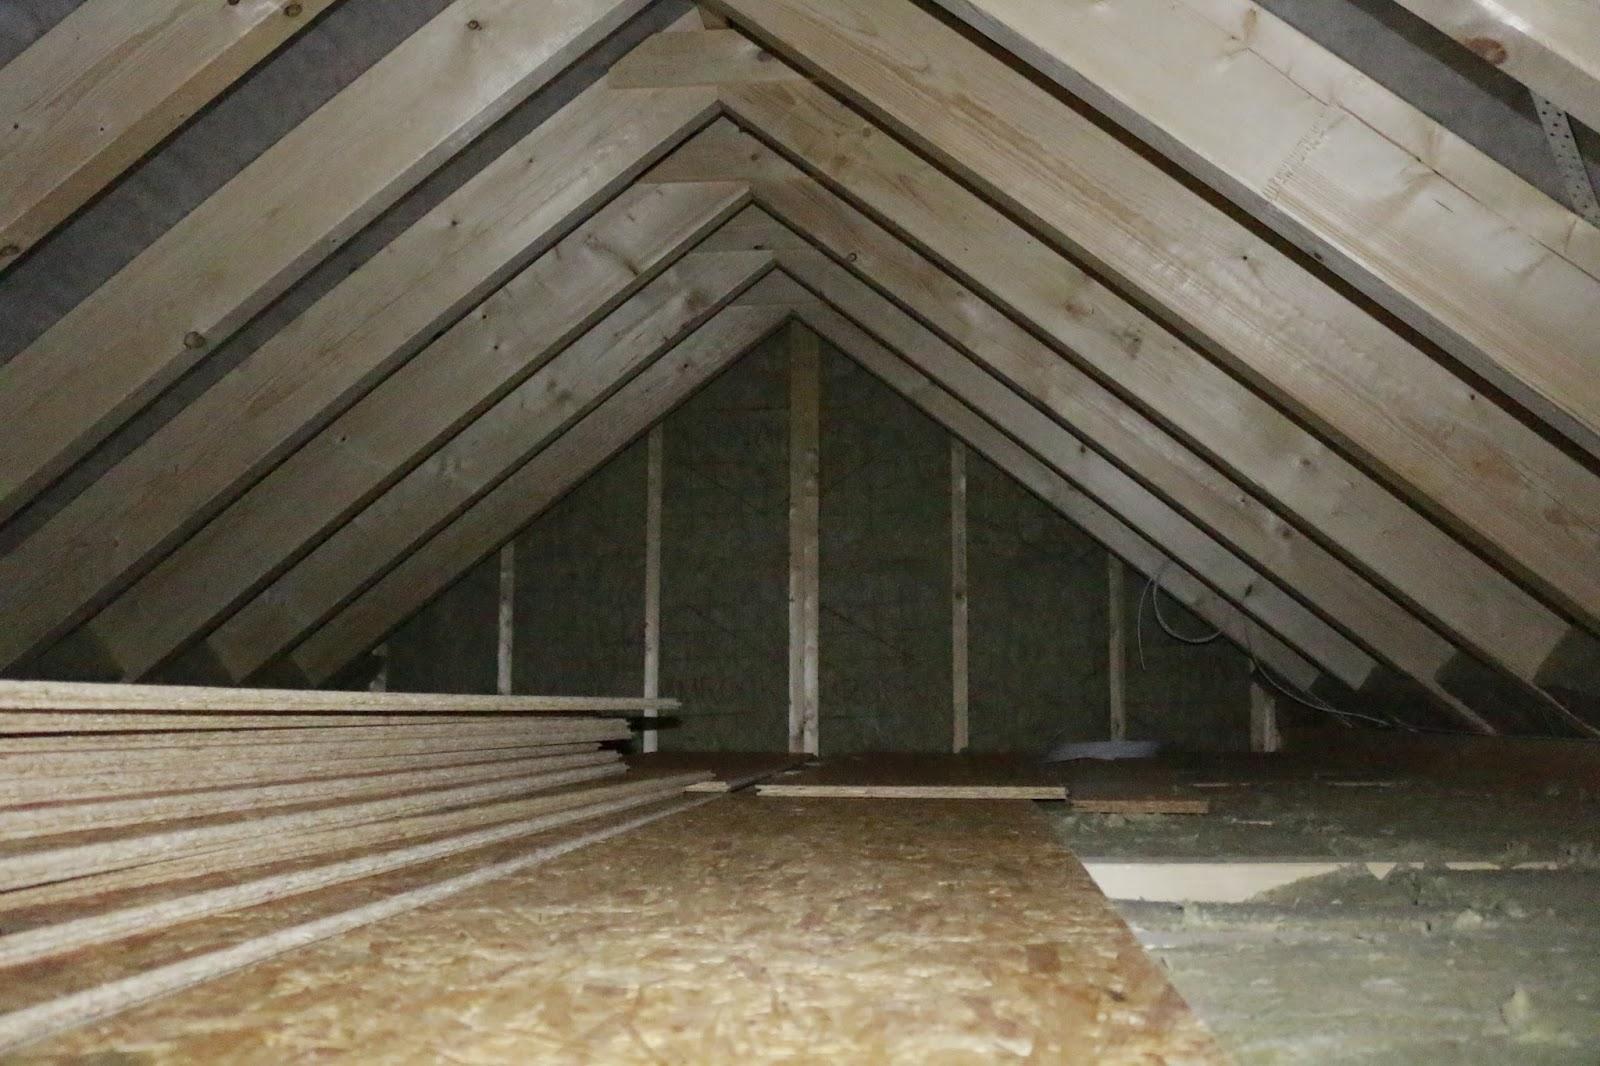 dachboden ausbauen fuboden lsst raum fr kreative lsungen with dachboden ausbauen fuboden fr. Black Bedroom Furniture Sets. Home Design Ideas